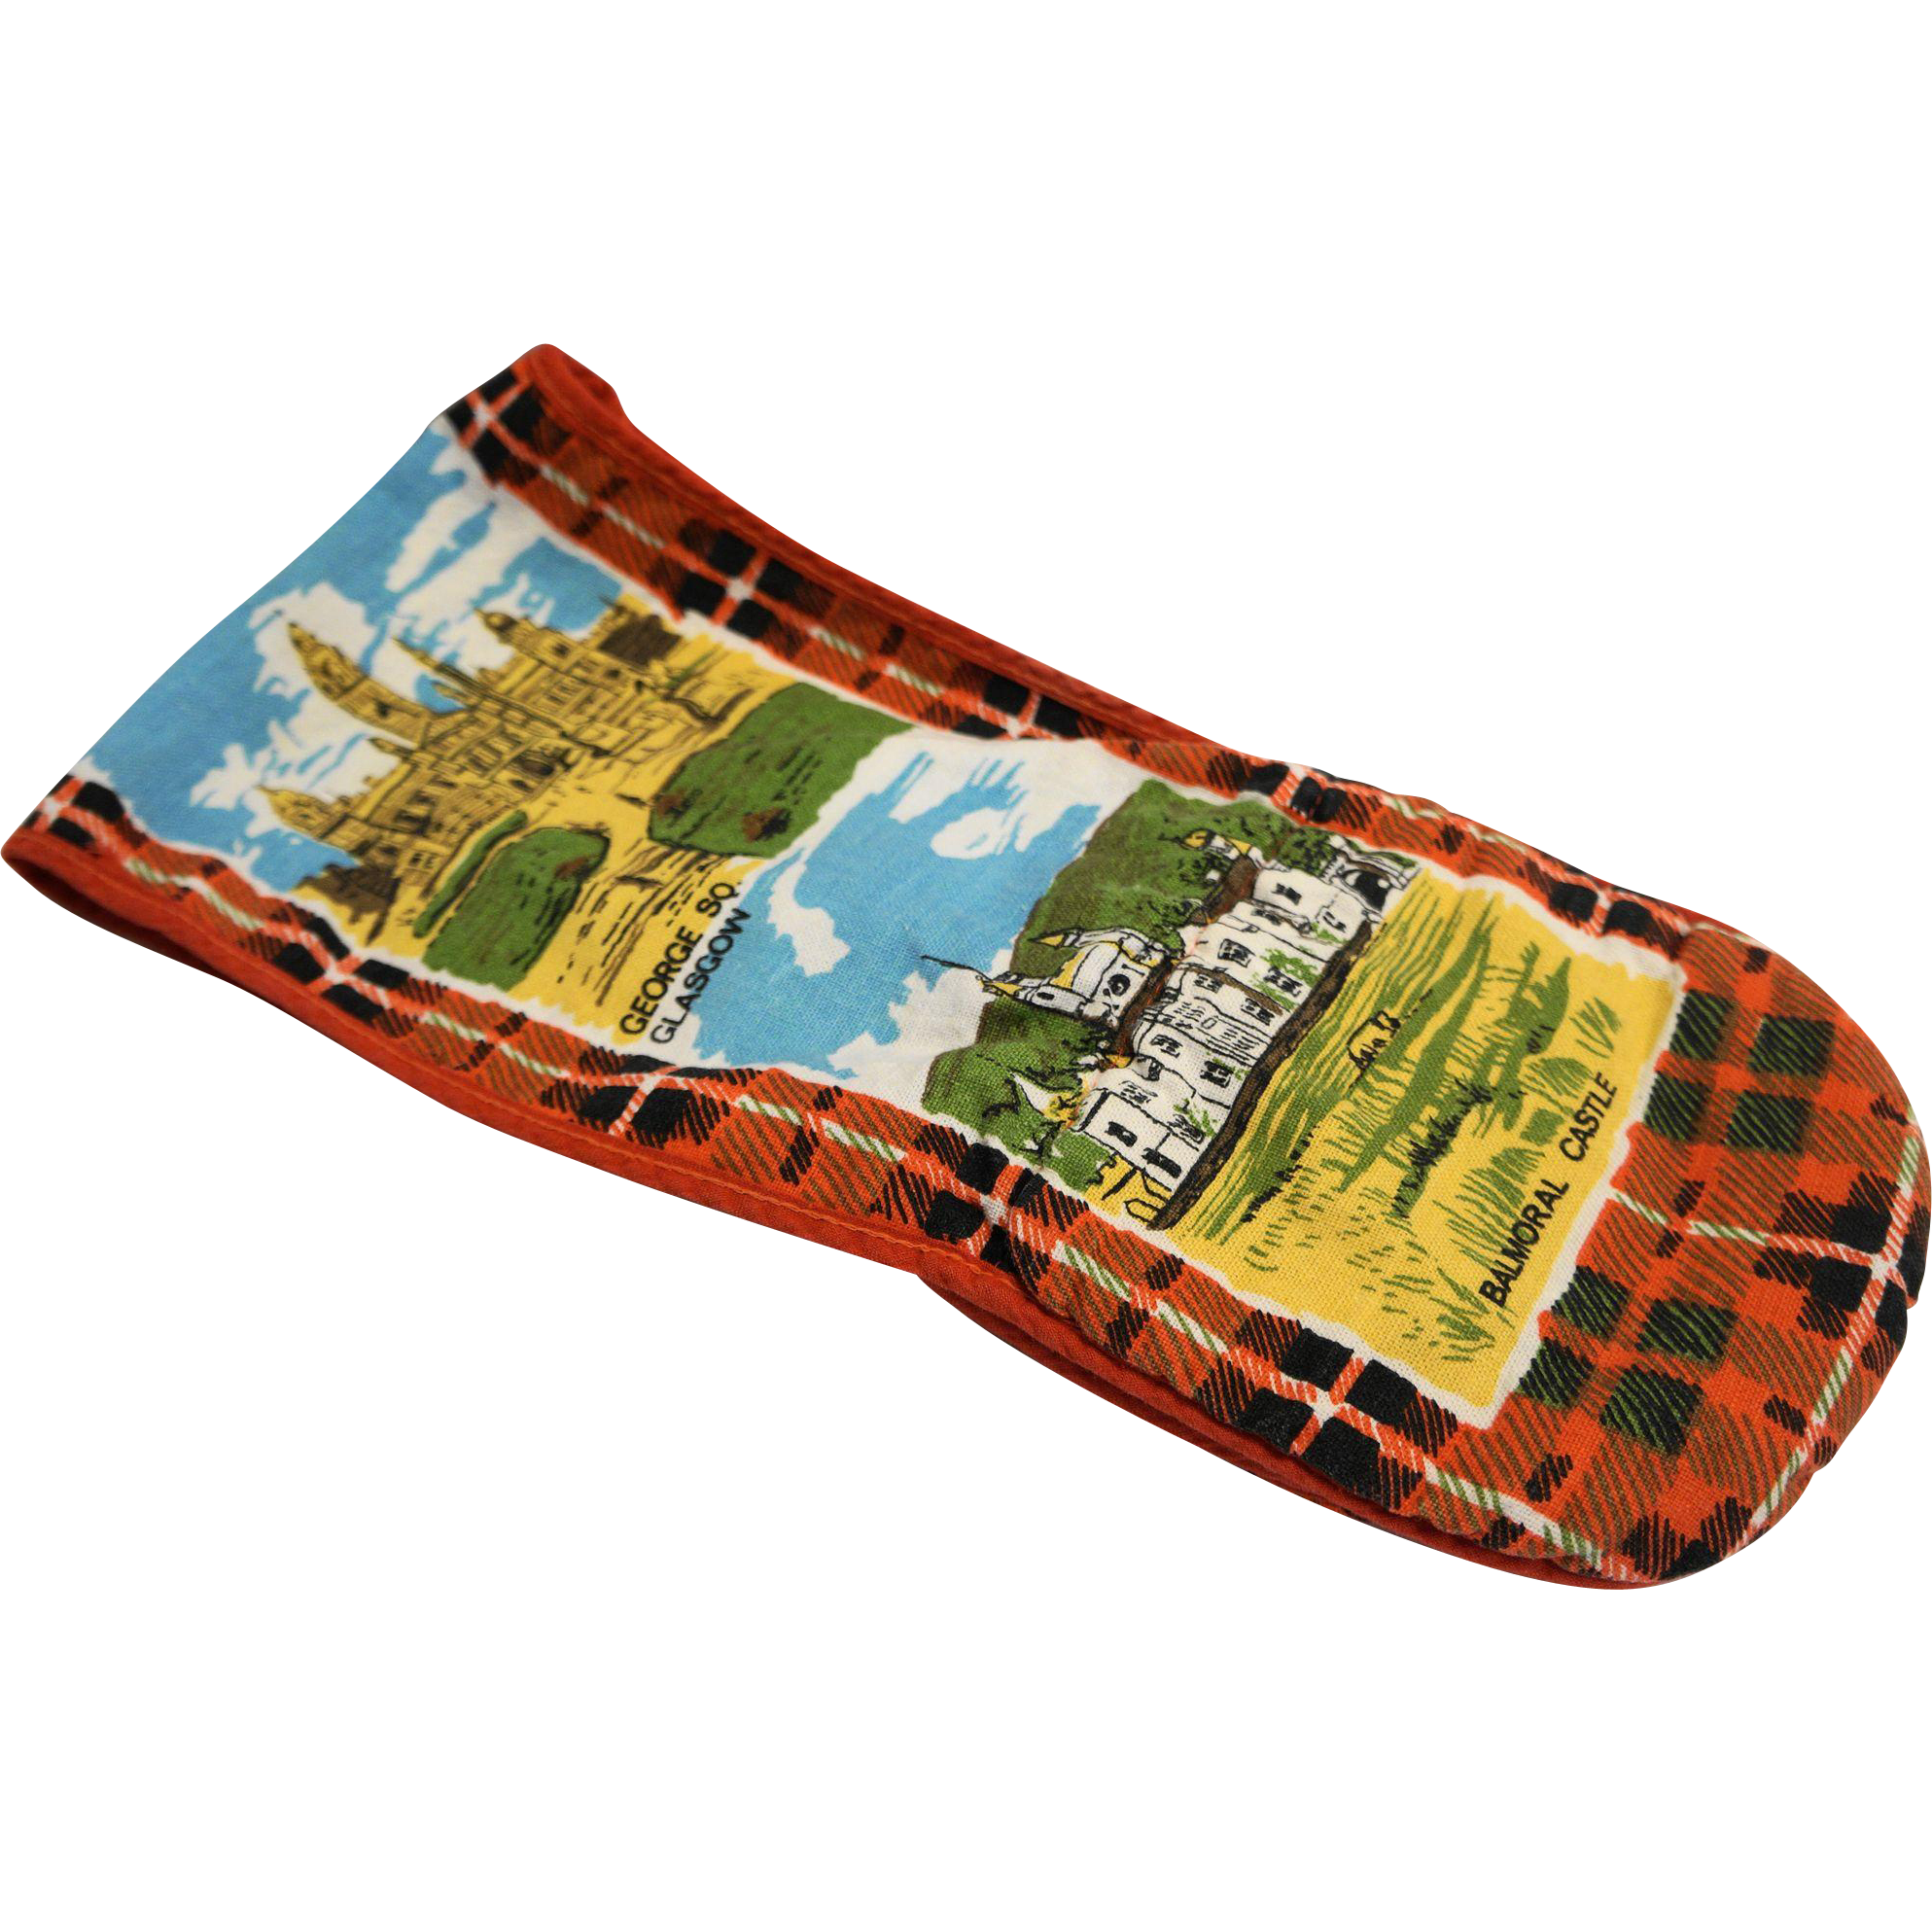 Scotland Souvenir Linen Printed Tea Towel Pot Holder Oven Mitt Combo